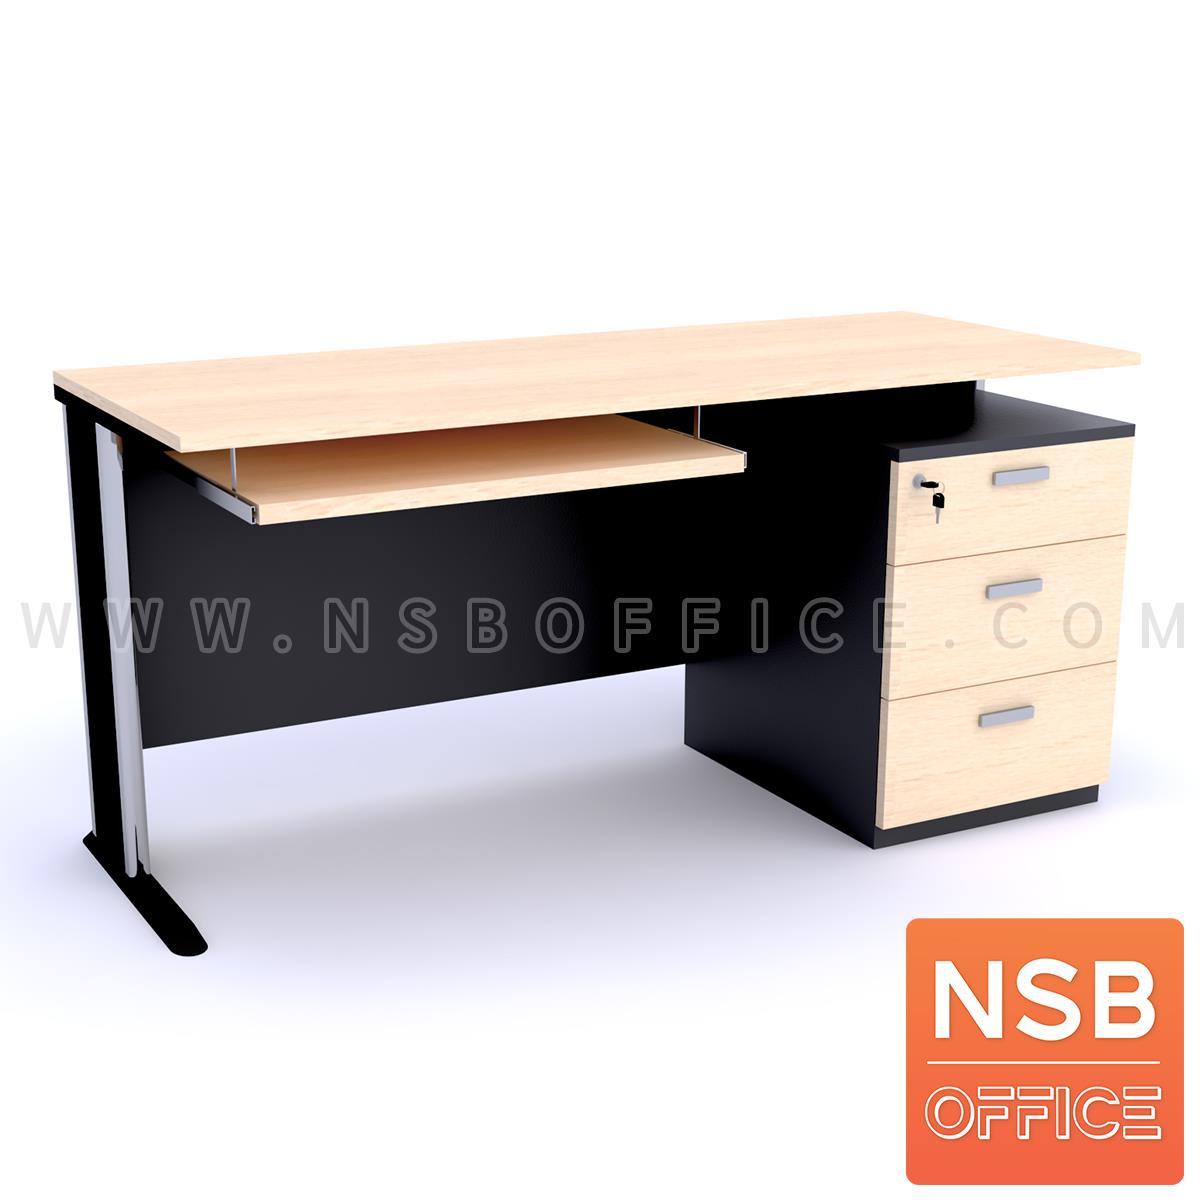 A18A024:โต๊ะคอมพิวเตอร์ 3 ลิ้นชัก พร้อมรางคีย์บอร์ด รุ่น MODERN-2 ขนาด 120W ,150W cm. (*60D)